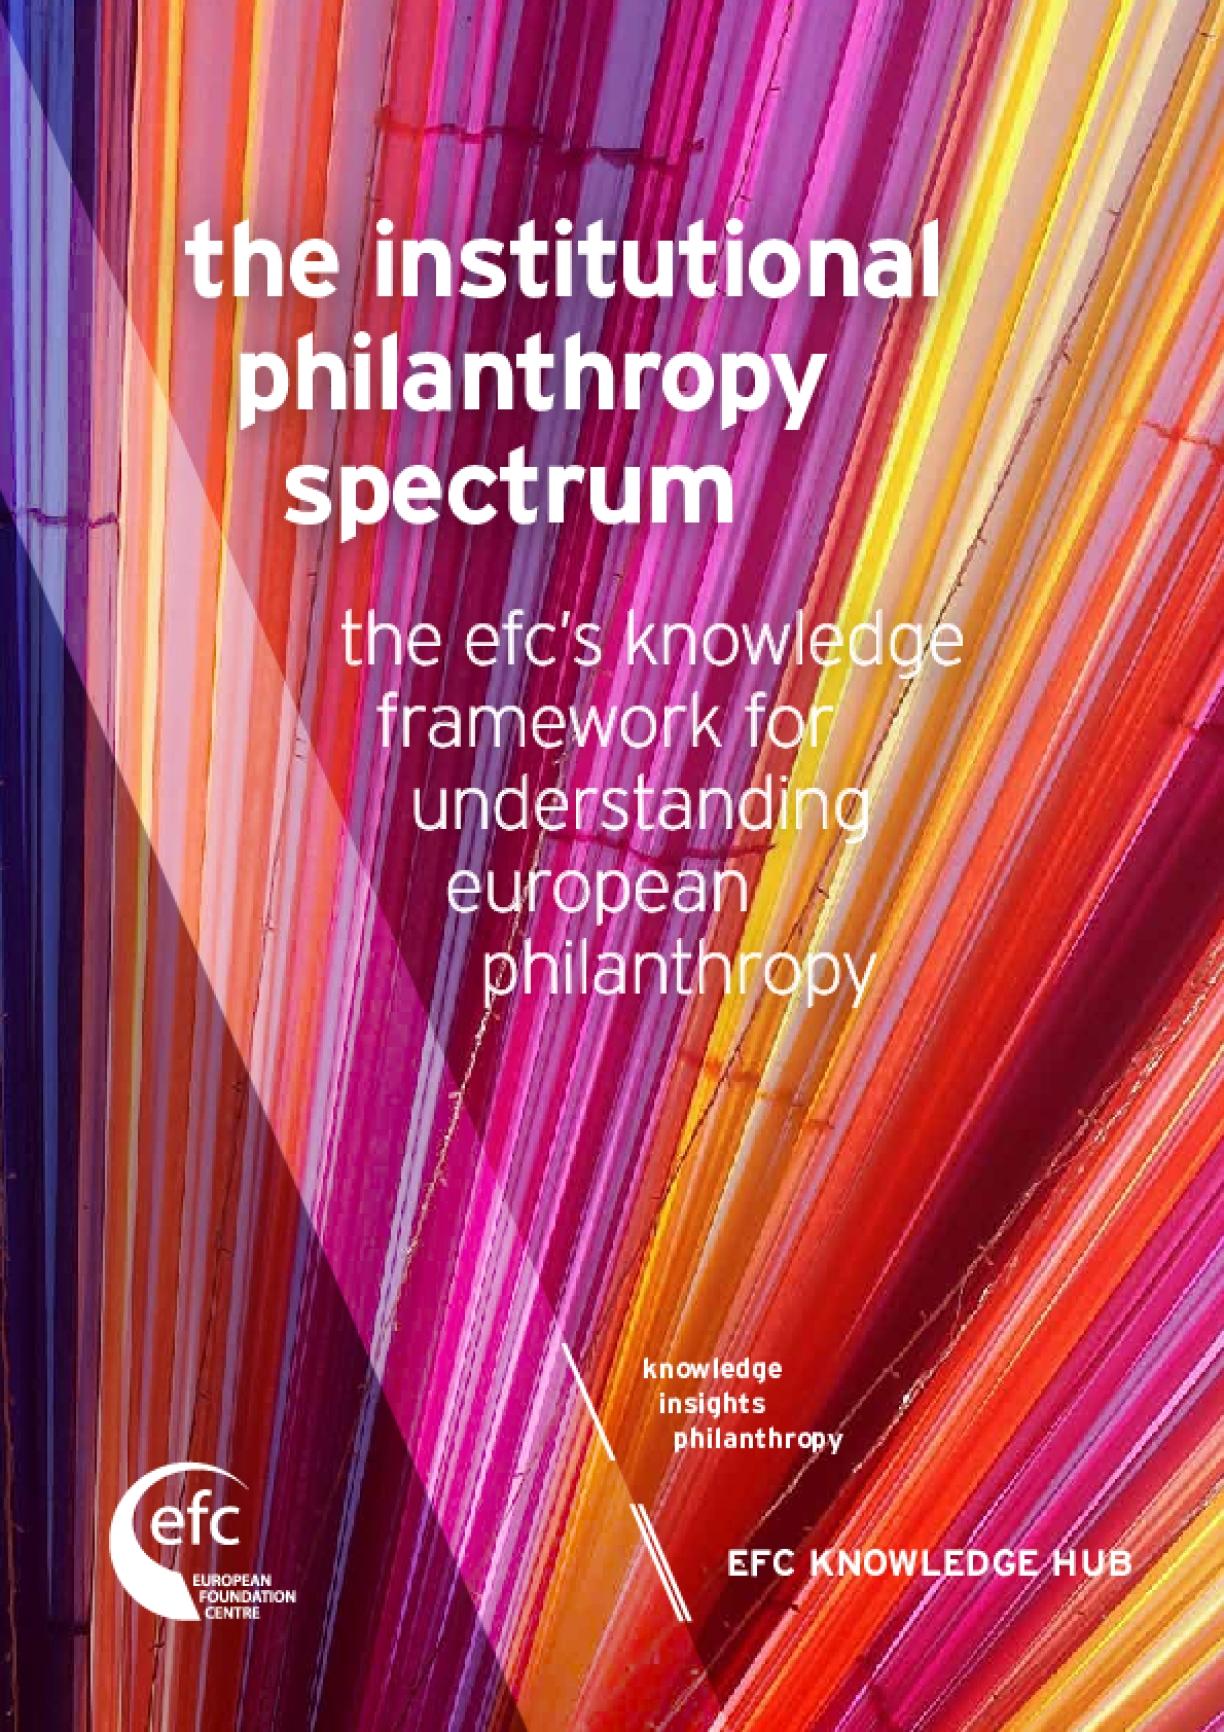 The Institutional Philanthropy Spectrum: the EFC's Knowledge Framework for Understanding European Philanthropy